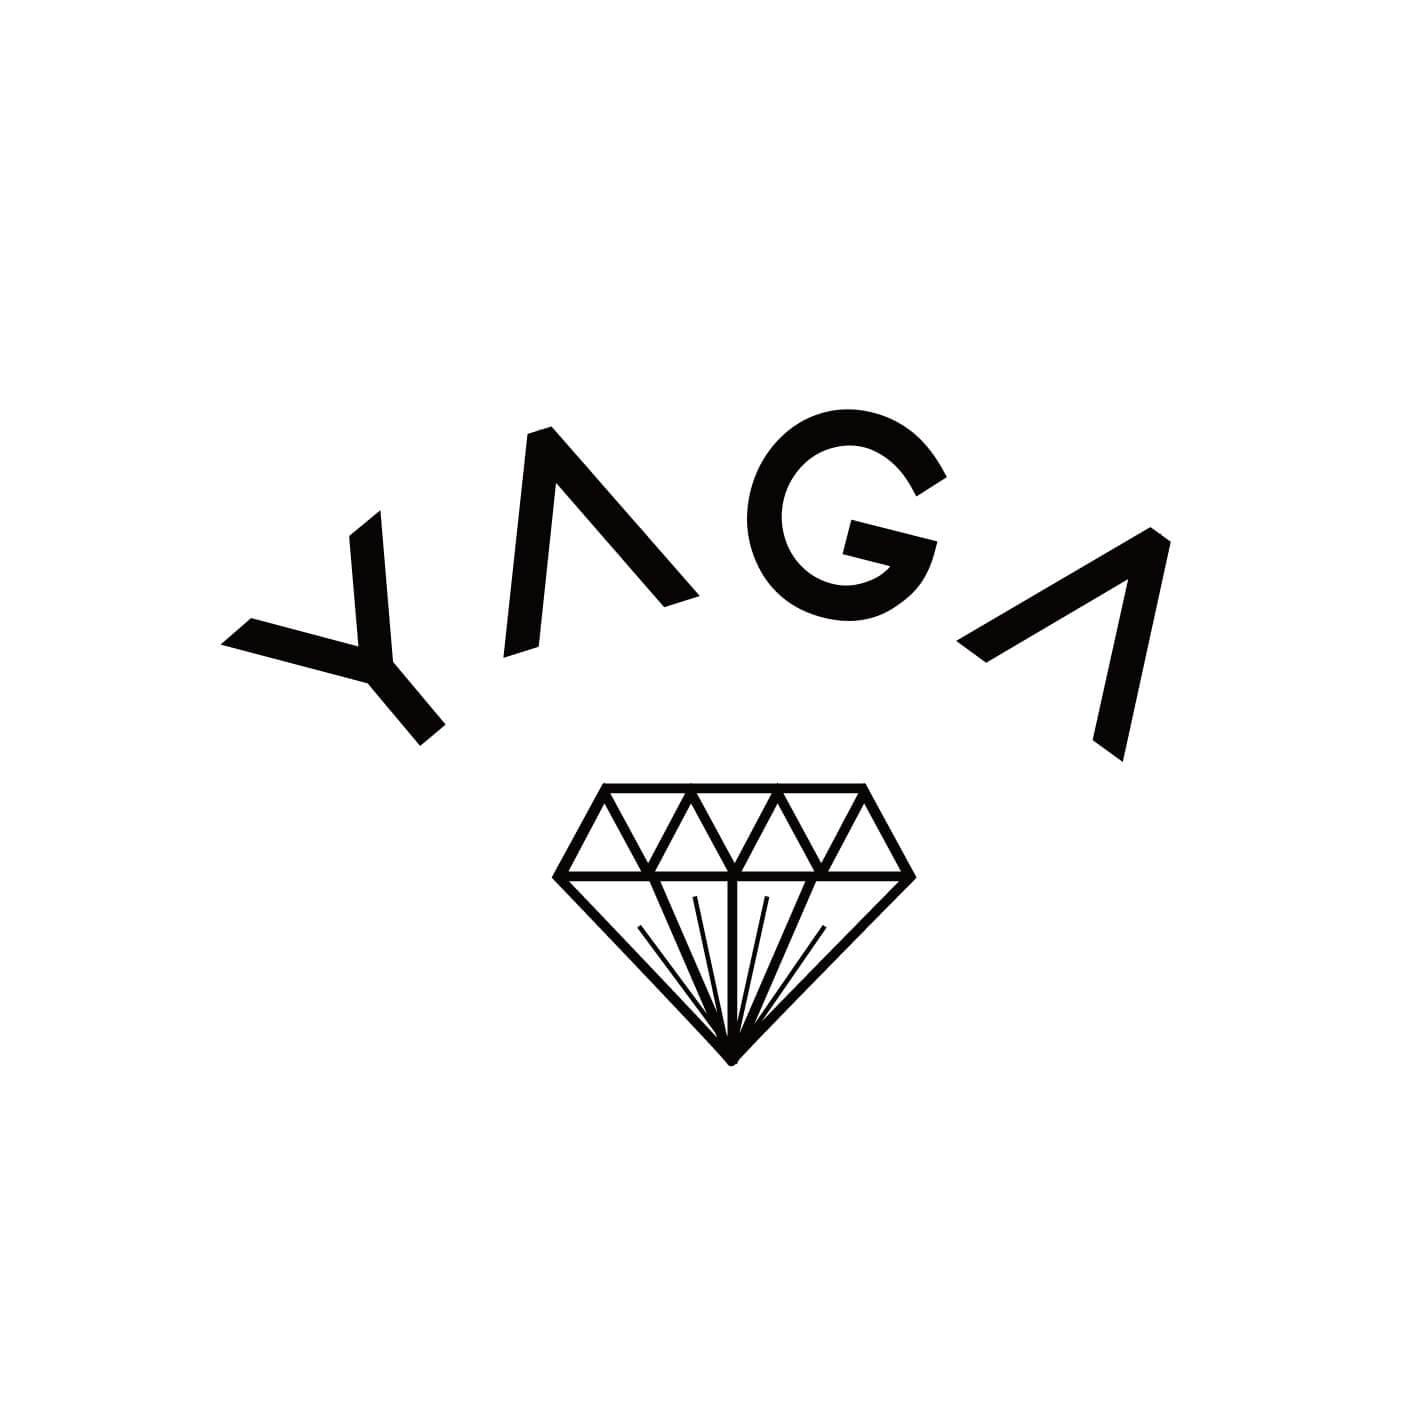 yaga_ロゴ